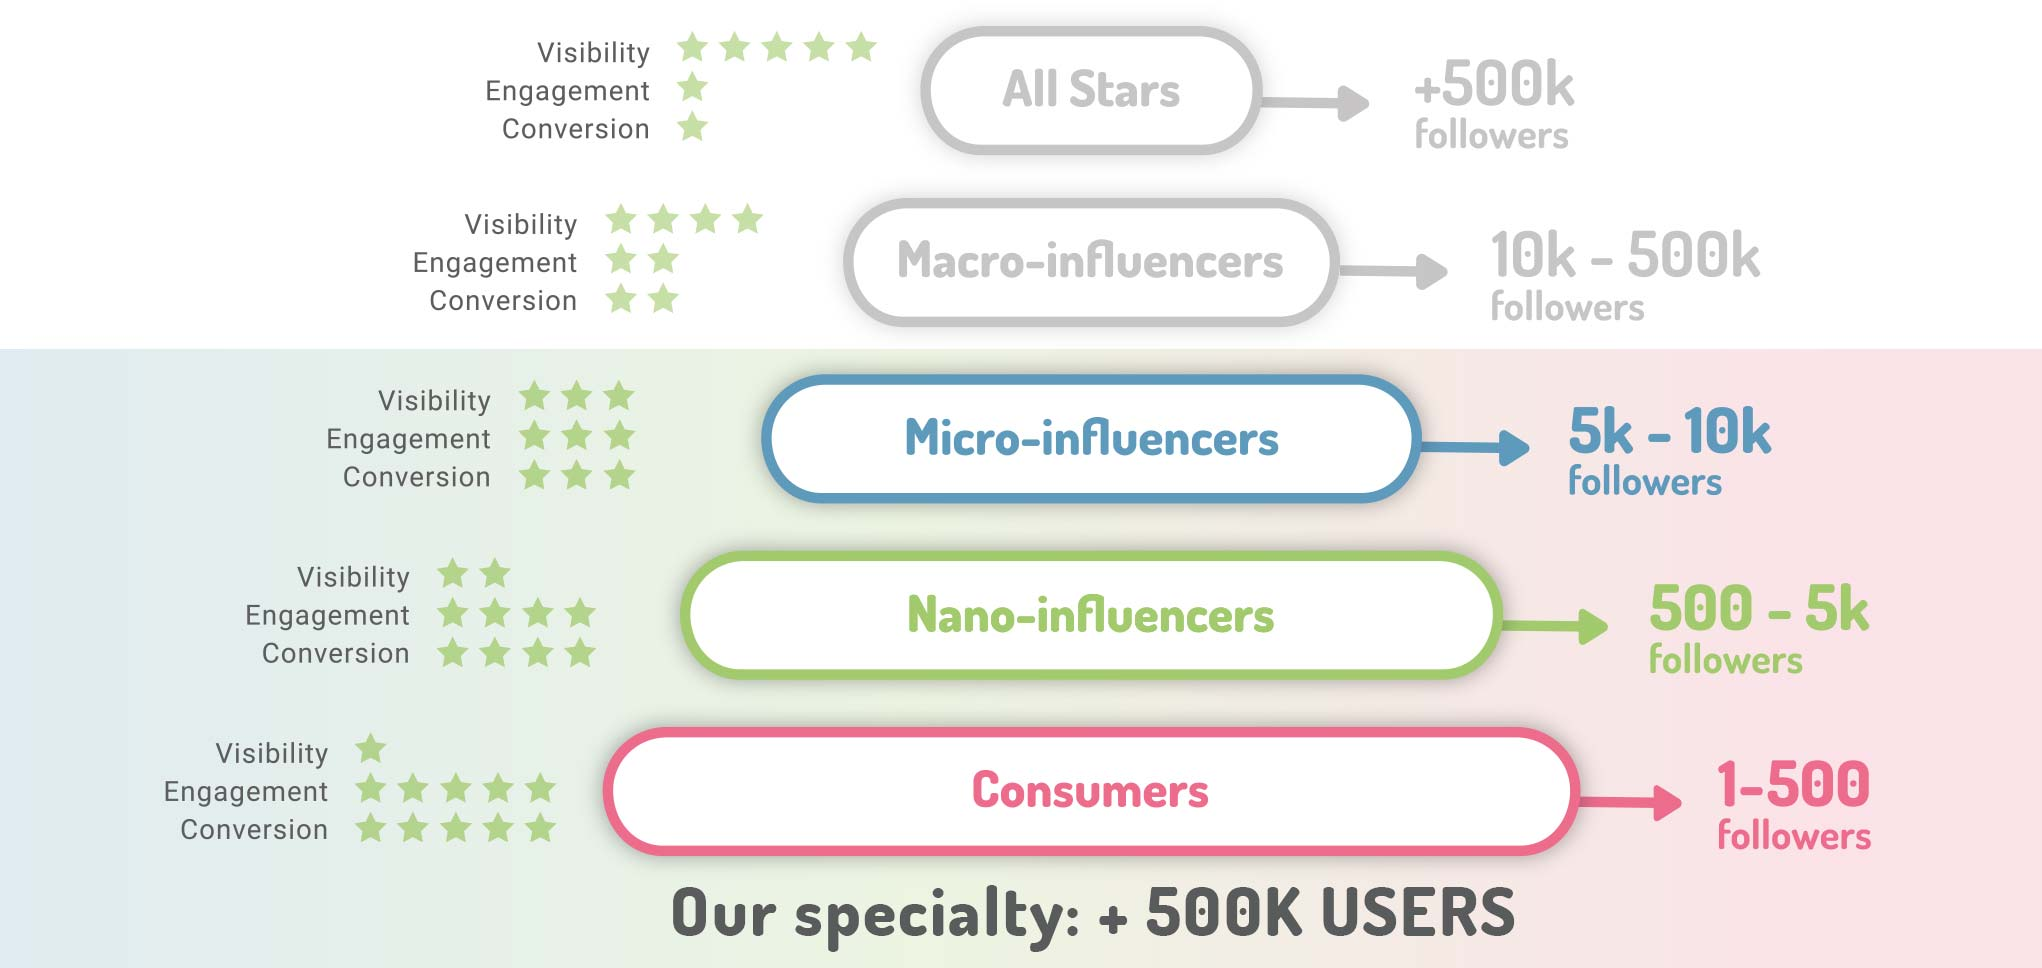 Categorized nano and micro influencers